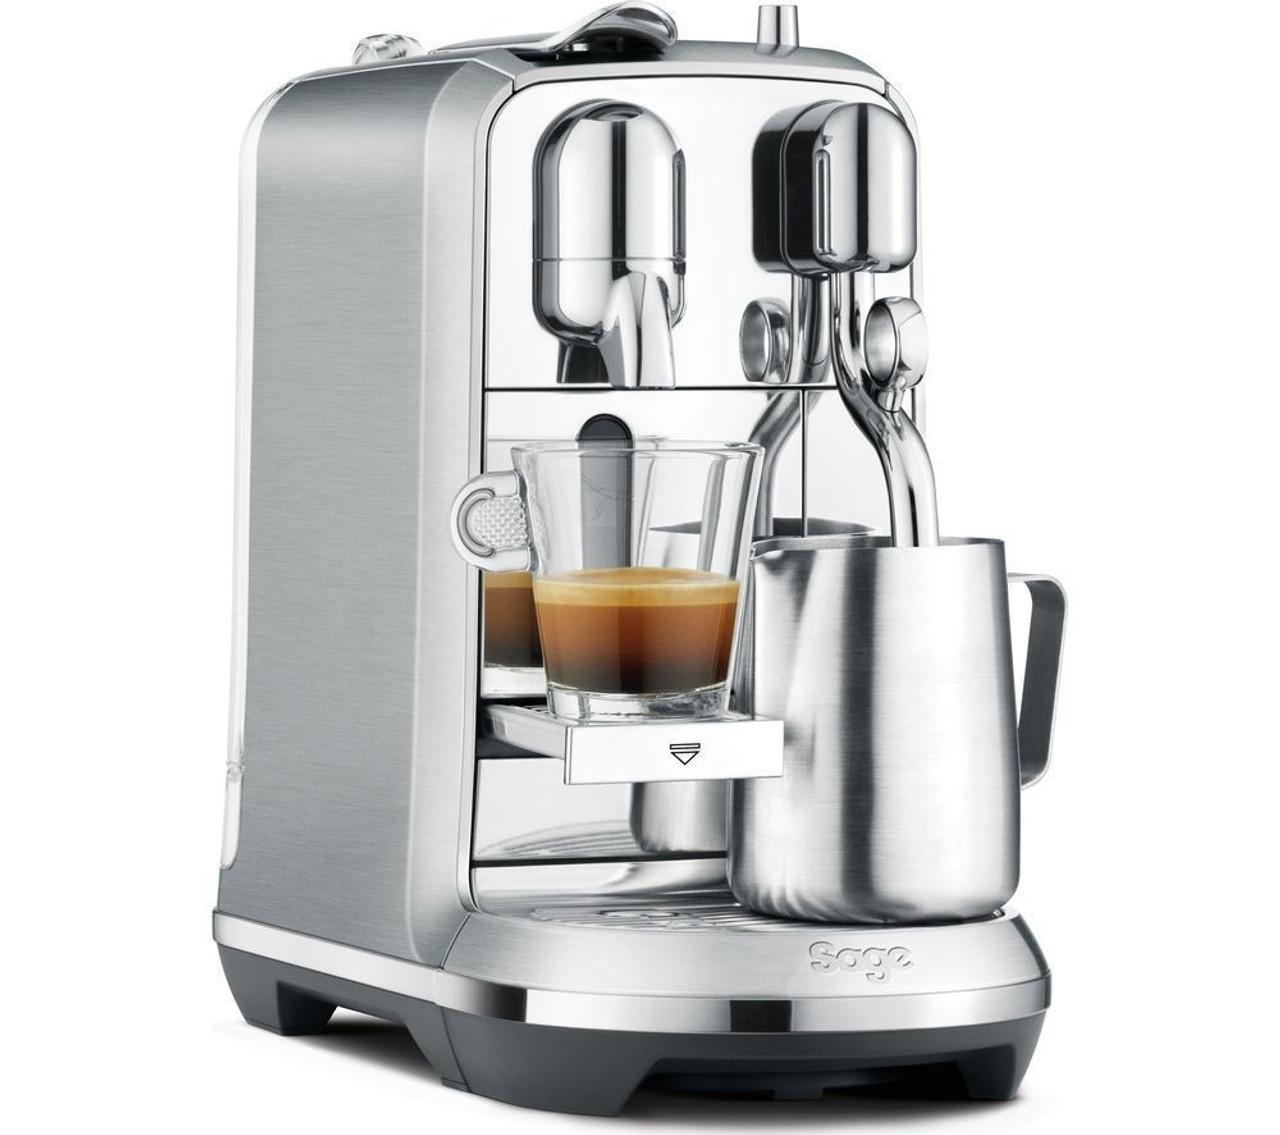 Breville Nespresso BNE800BSS Creatista Plus Capsule Machine - Stainless Steel